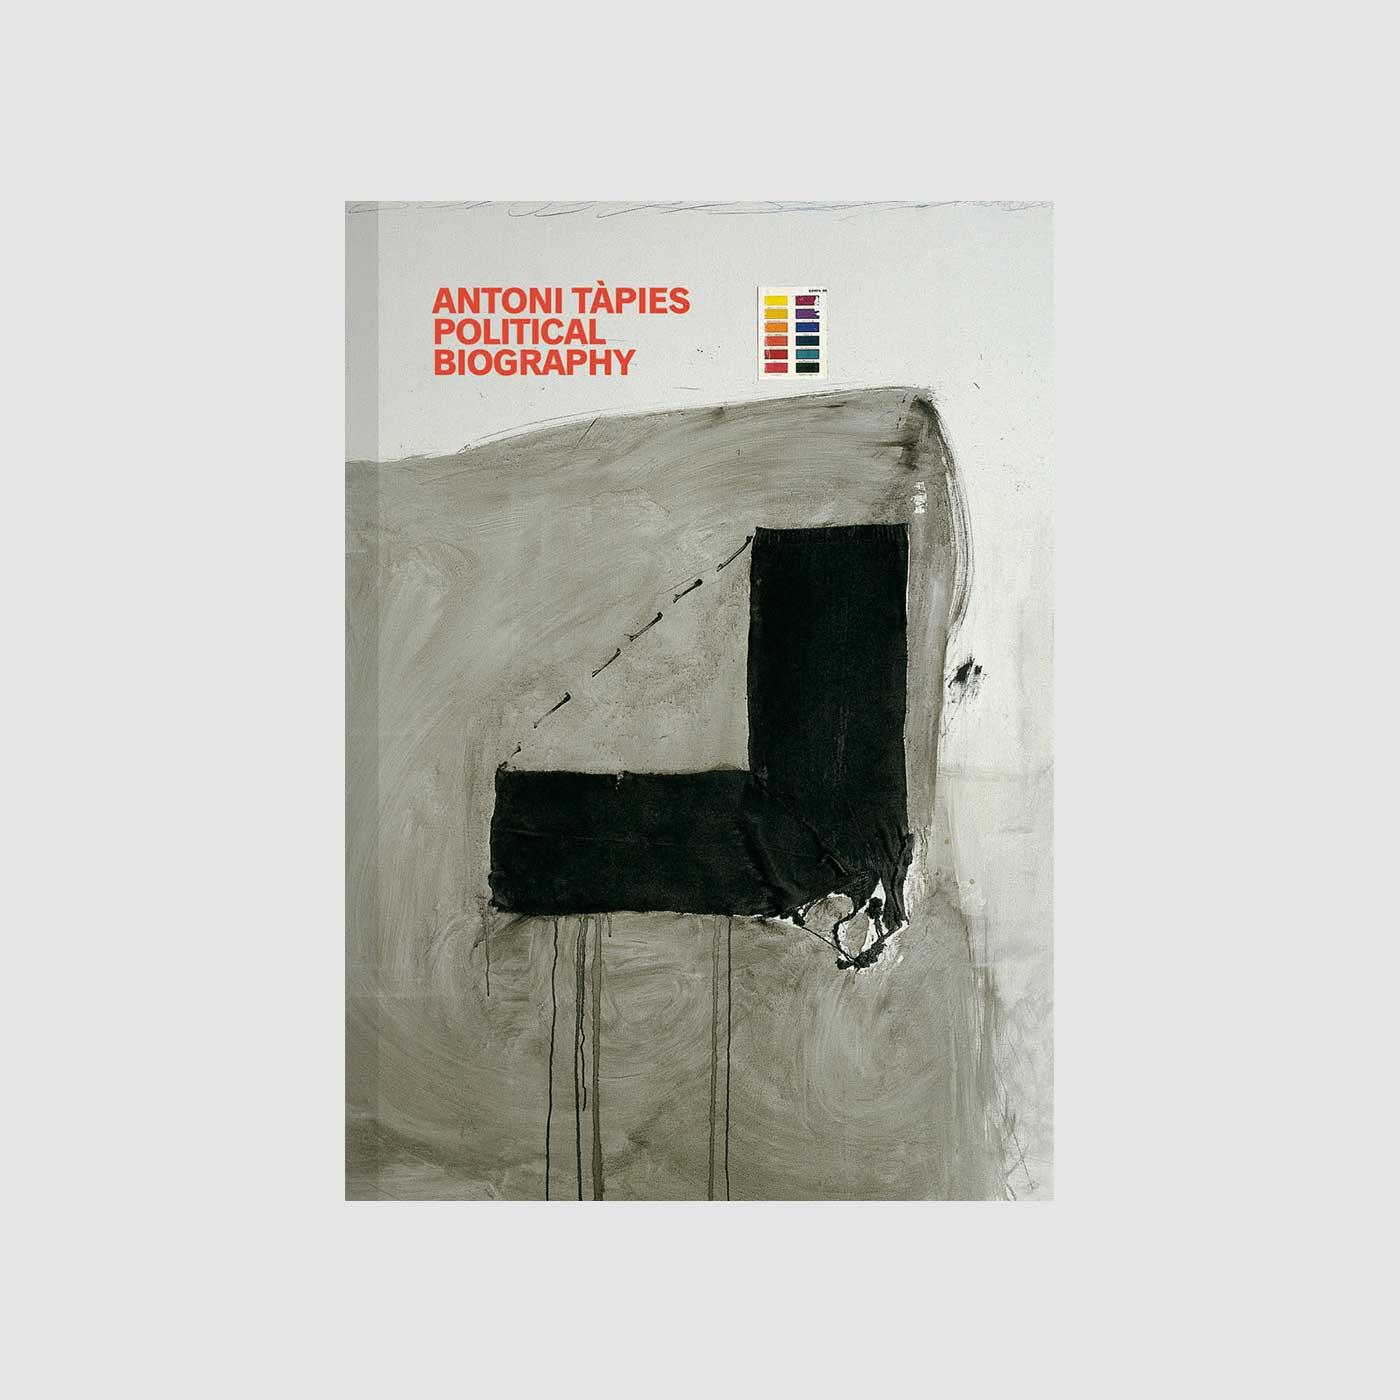 antoni-tapies-political-biography